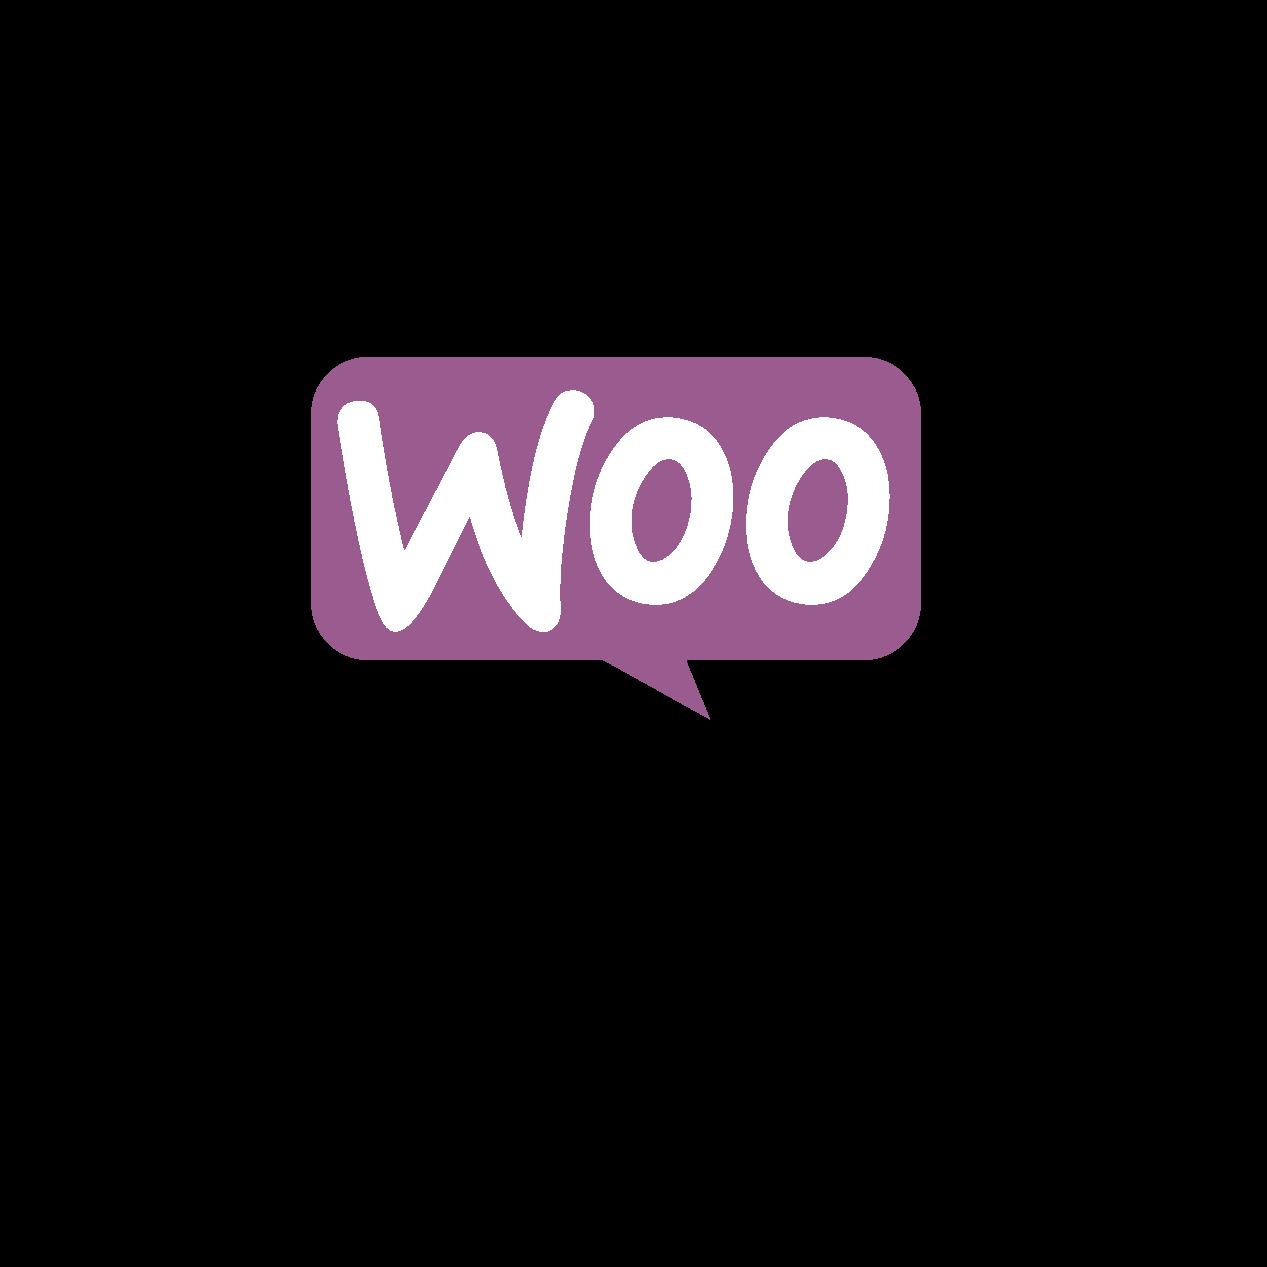 Keunggulan Woocommerce Yang Anda Ketahui